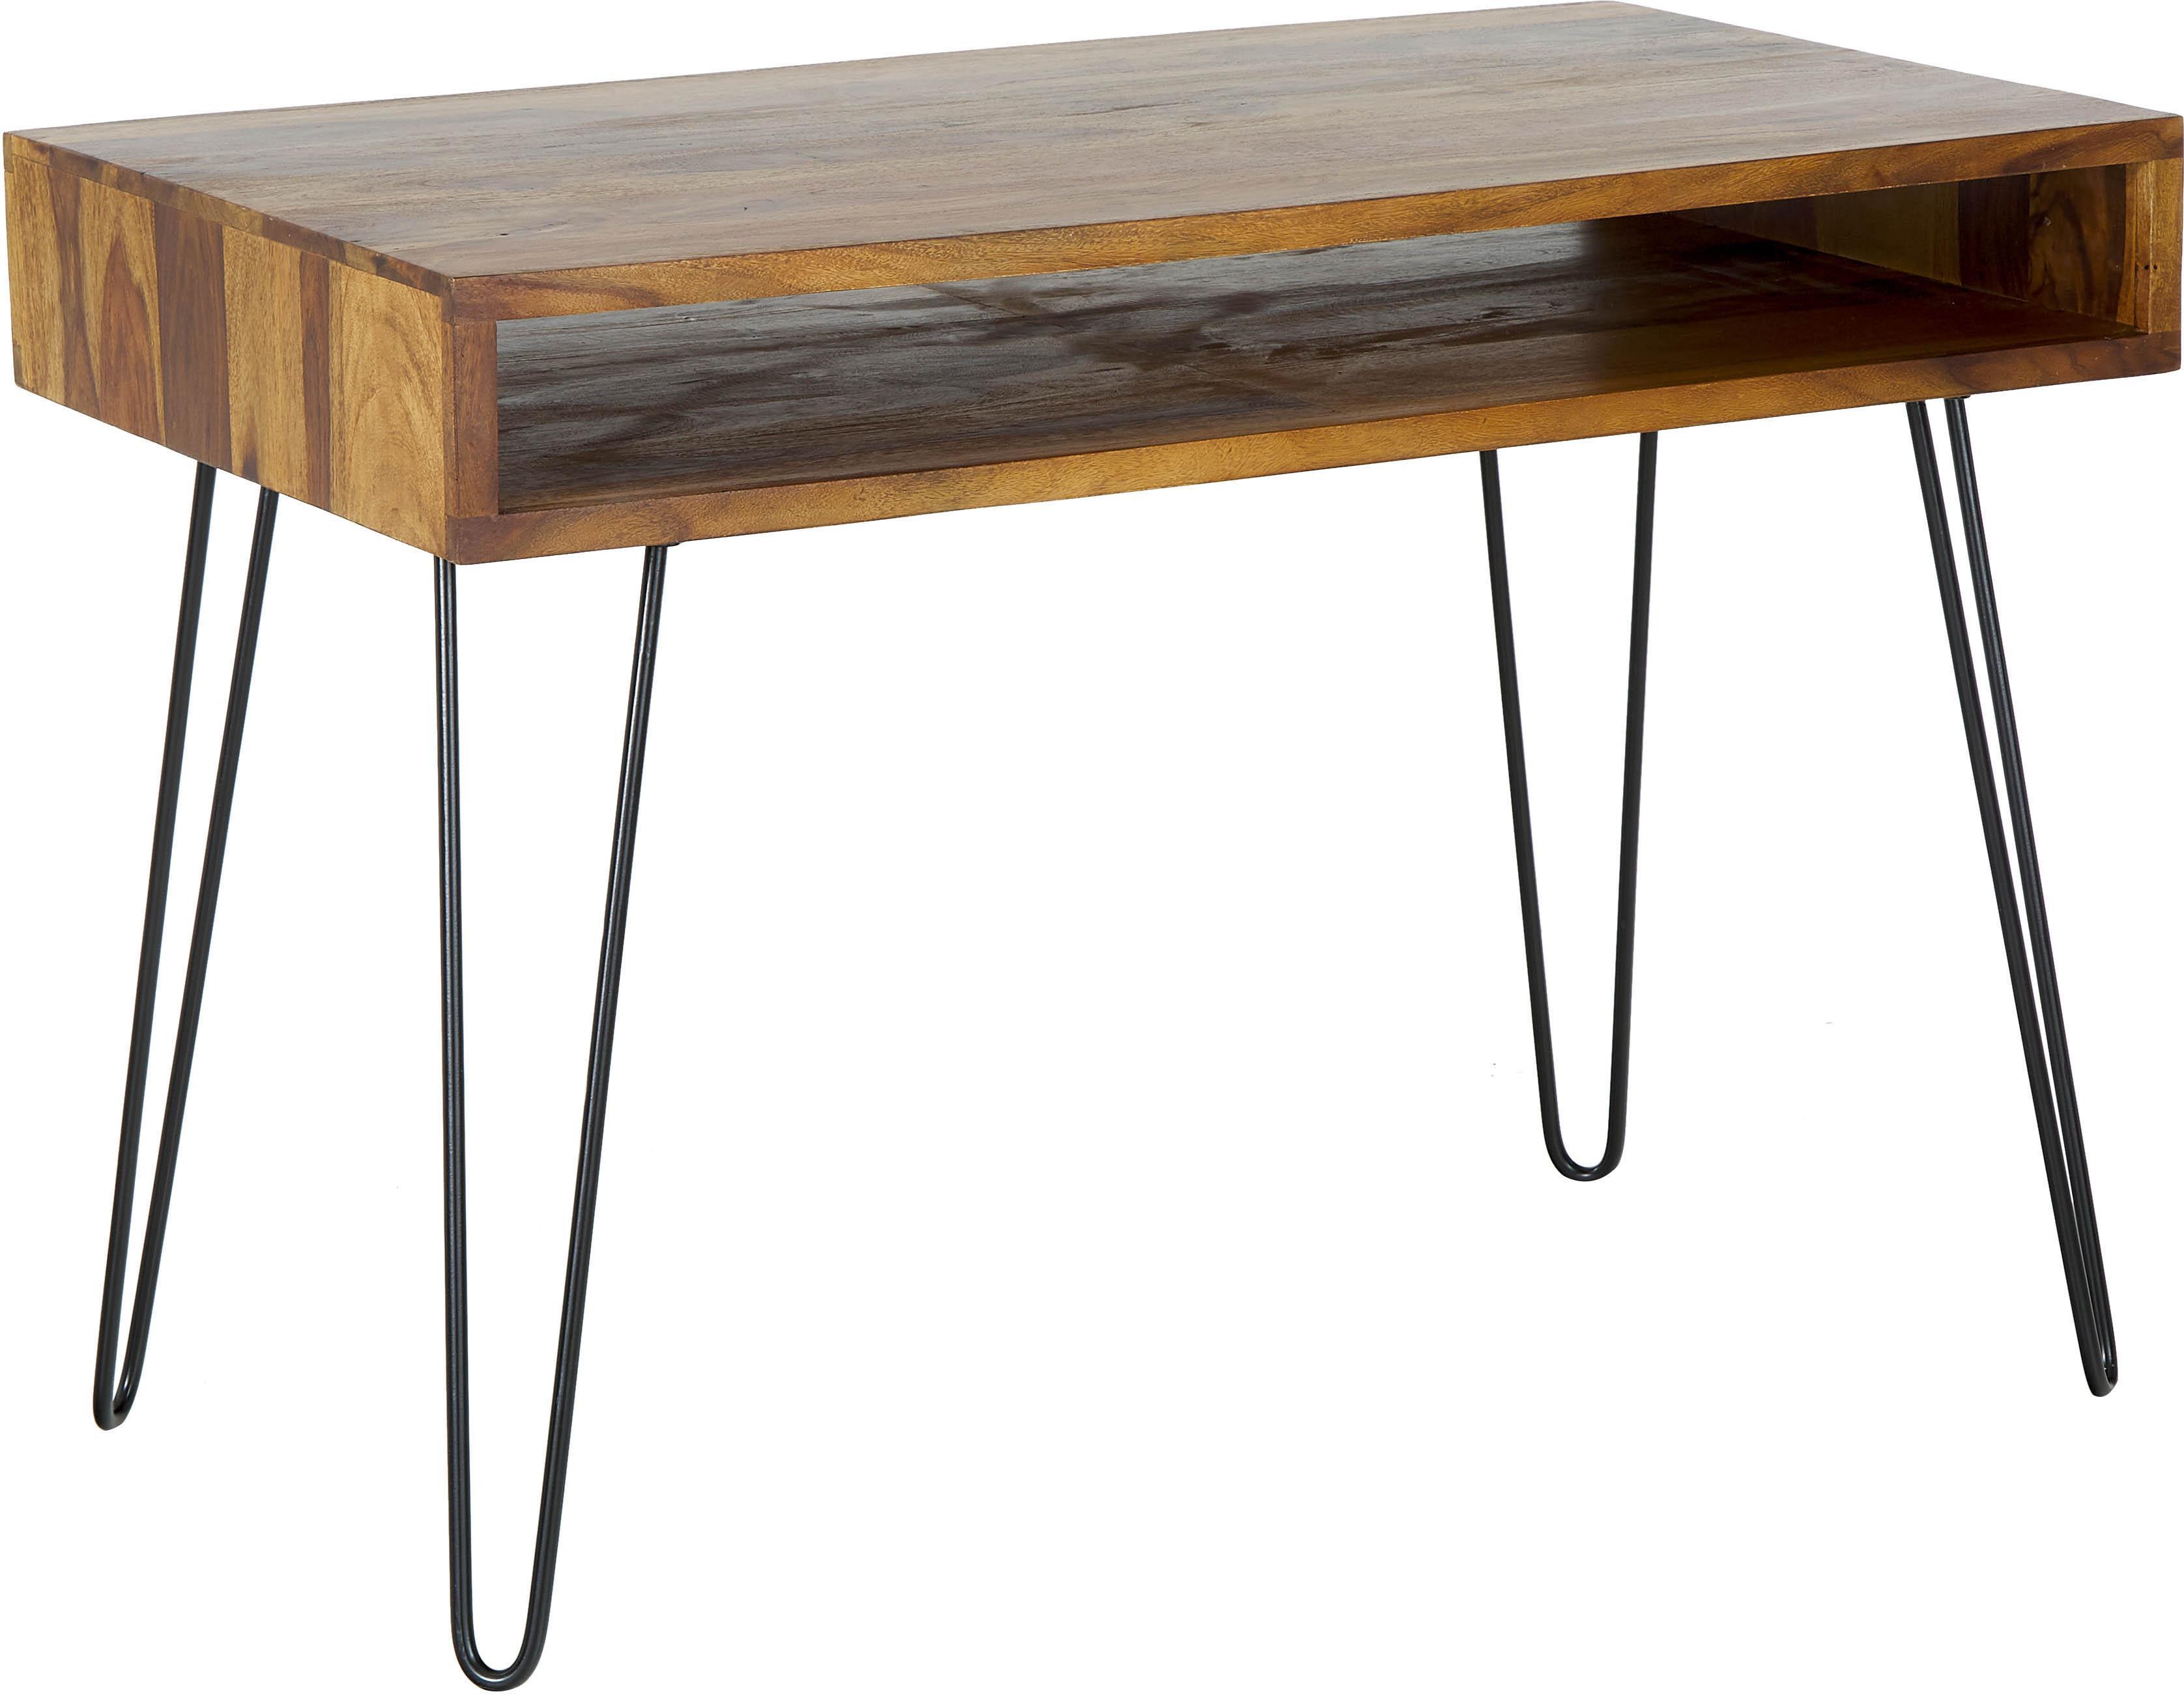 Escritorio de madera y metal Repa, Estructura: madera de sheesham maciza, Patas: metal pintado, Madera de sheesham, negro, An 110 x Al 76 cm